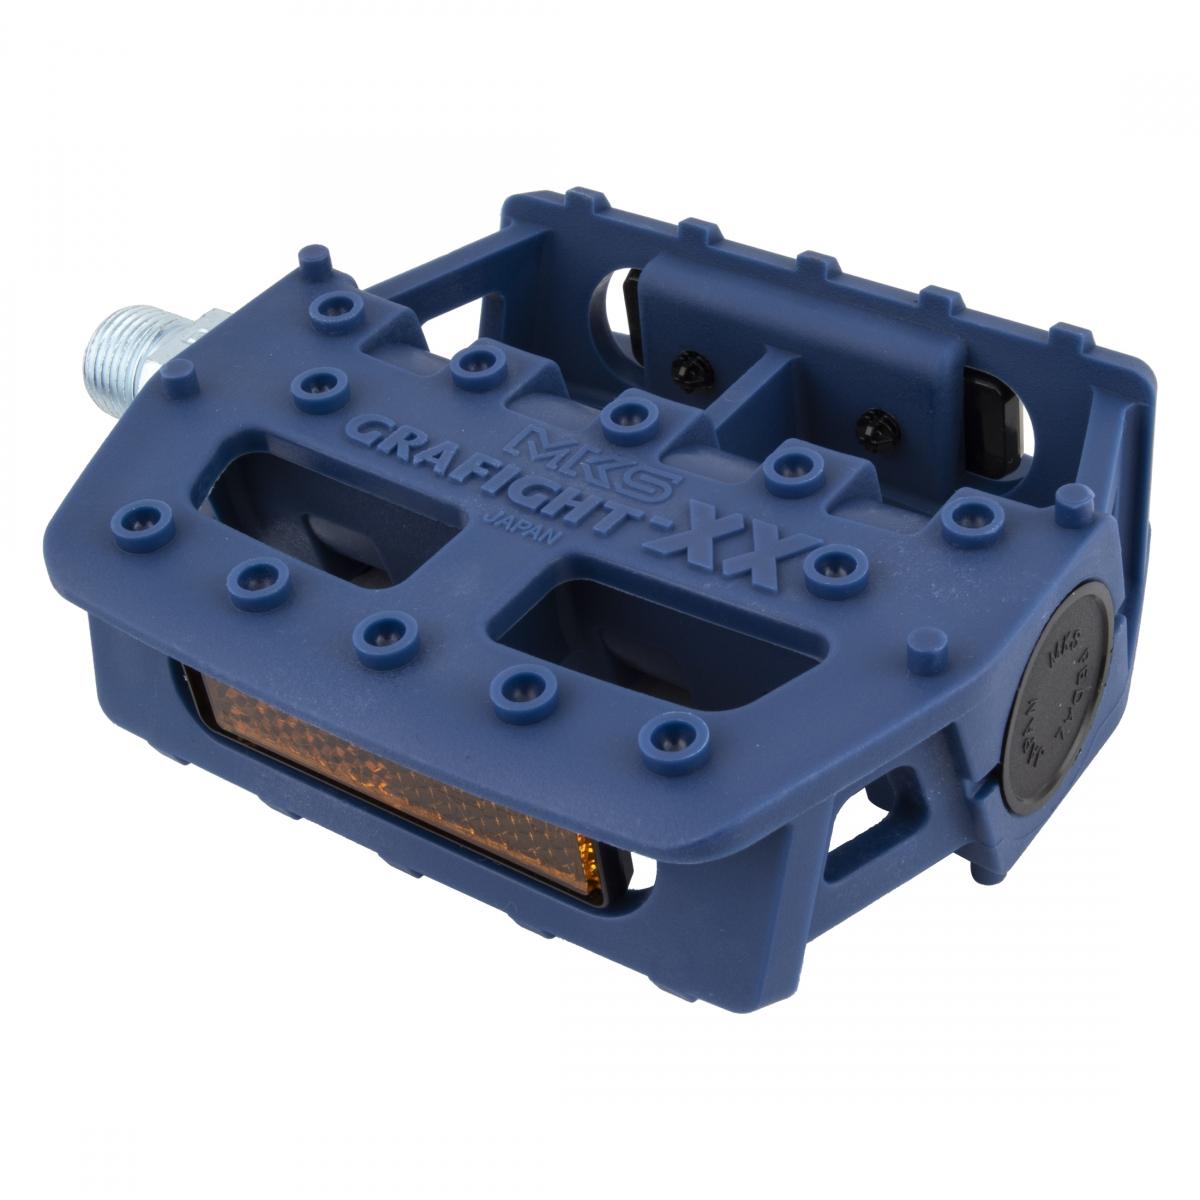 Mks RMX Pedals Mks Rmx Platform 9//16 Sil